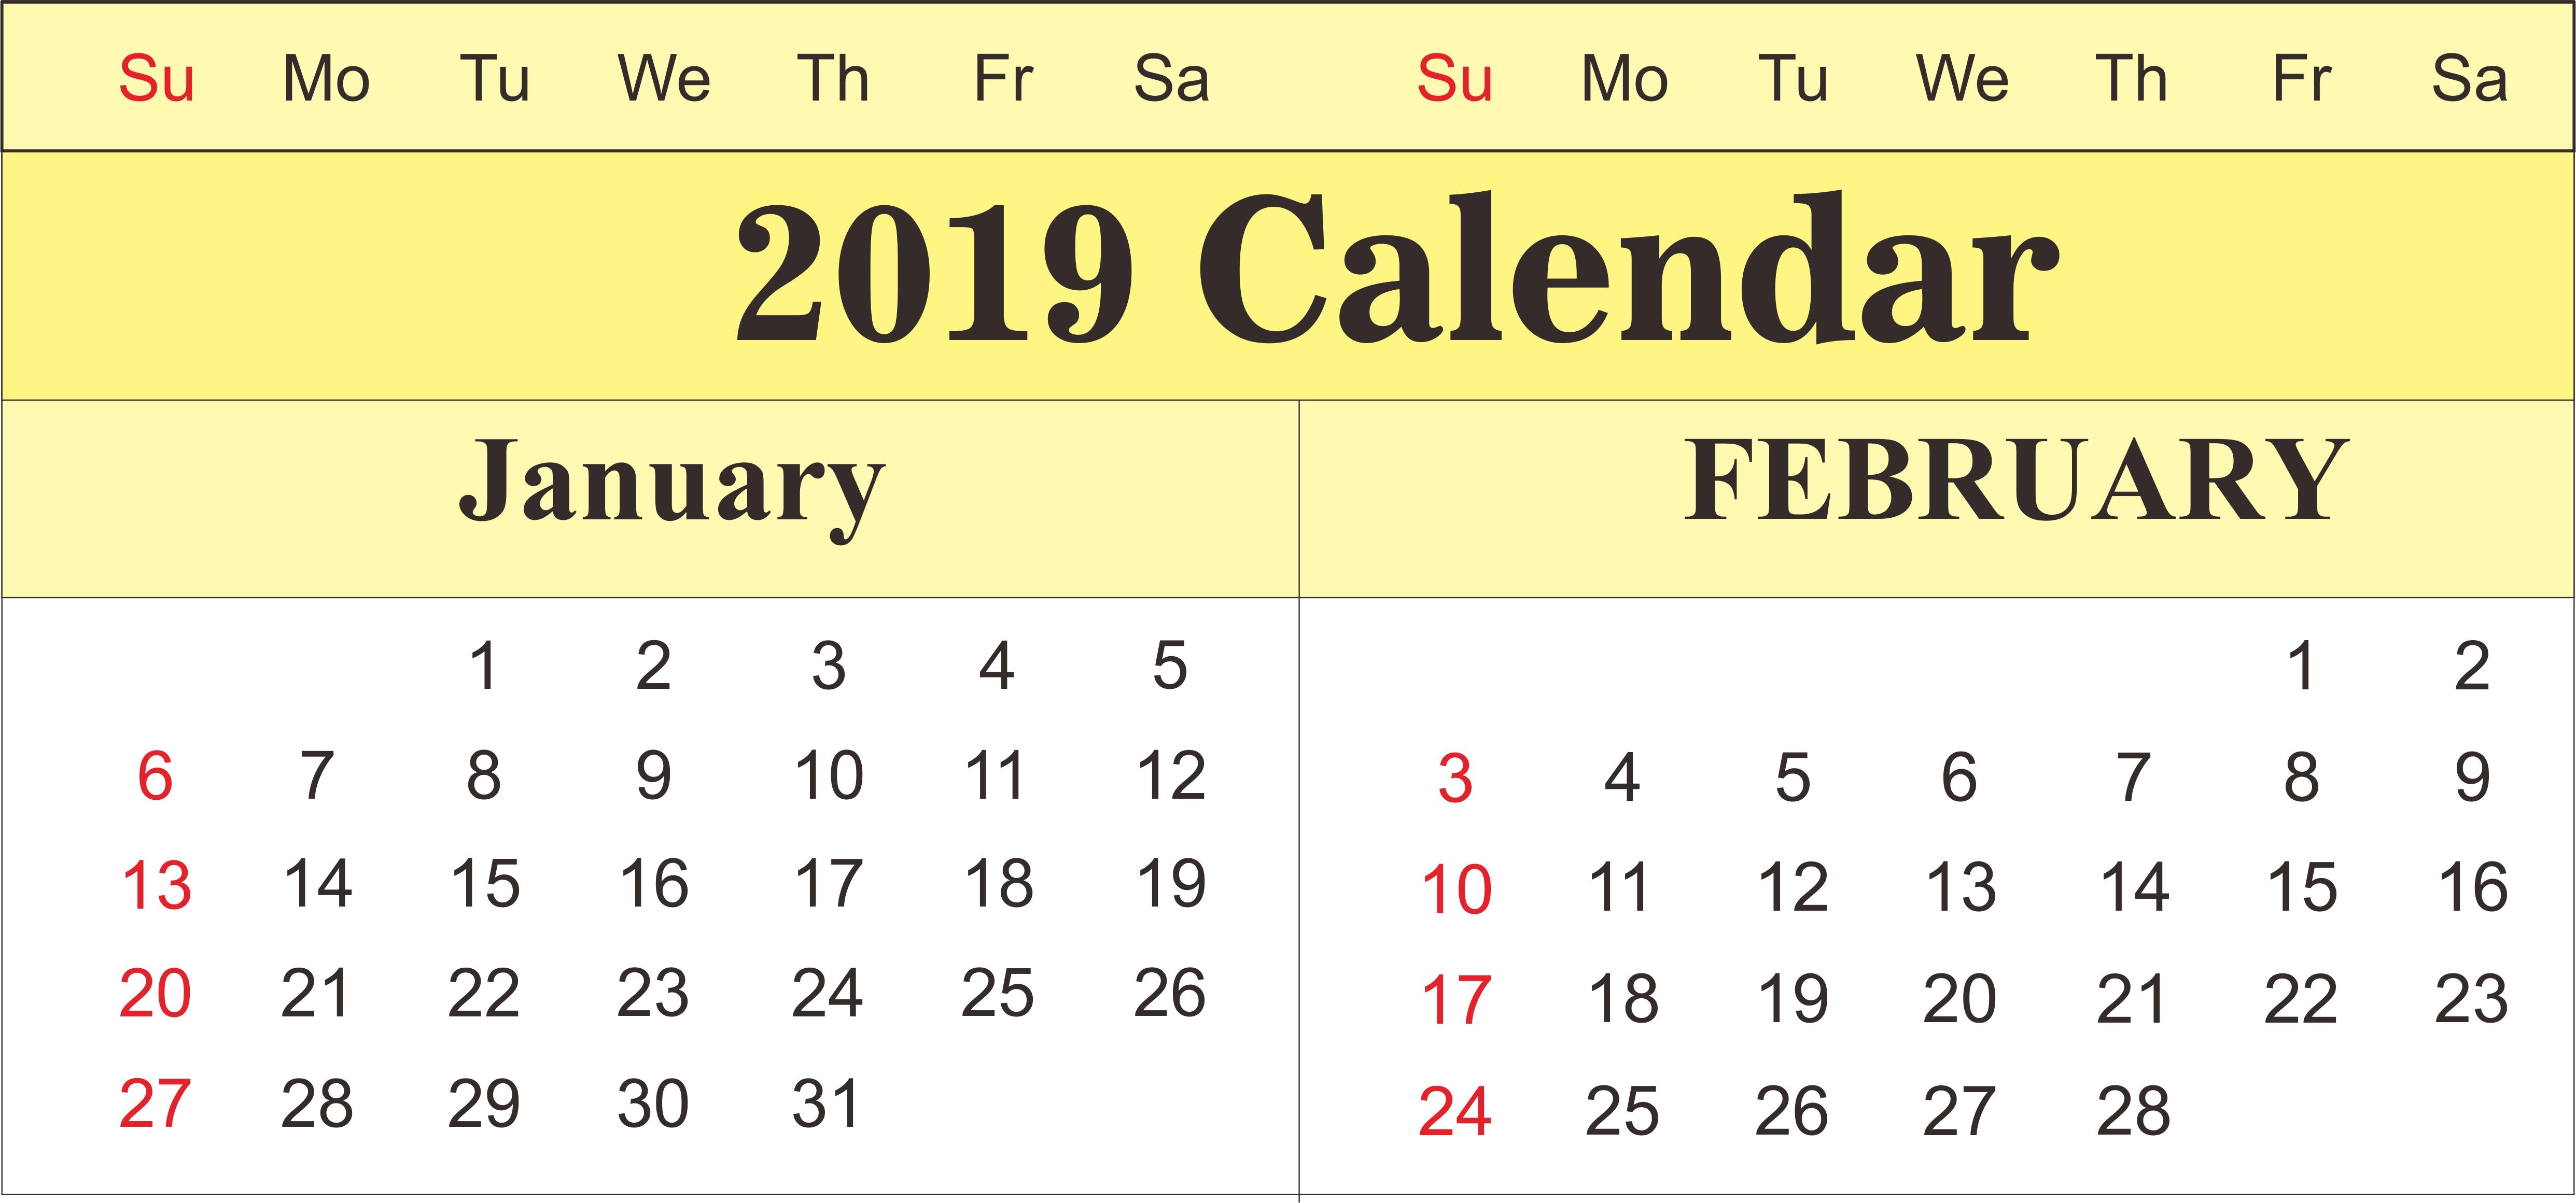 Printable January And February 2019 Calendar | 250+ February 2019 February 4 2019 Calendar